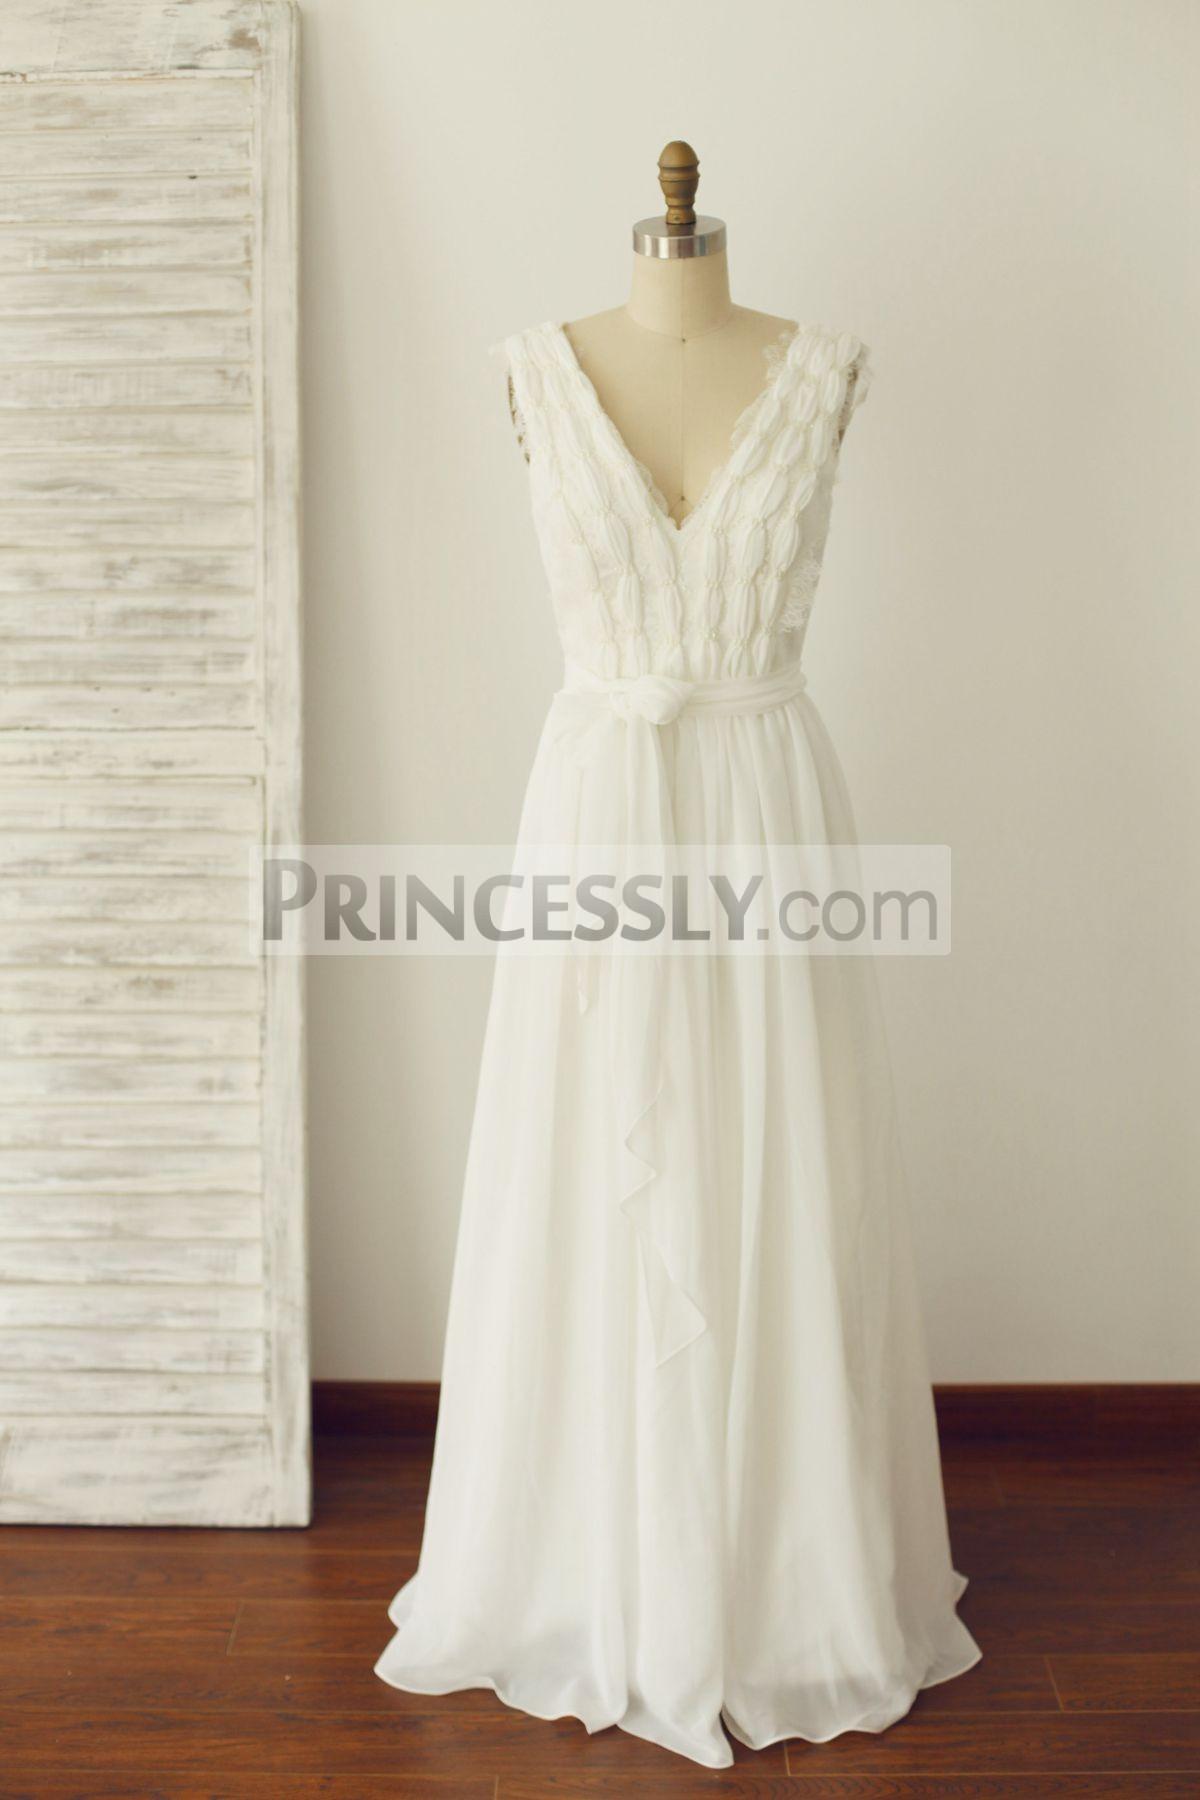 Princessly.com-K1000215-V Neck Ivory Lace Chiffon Wedding dress Bridal Gown-31